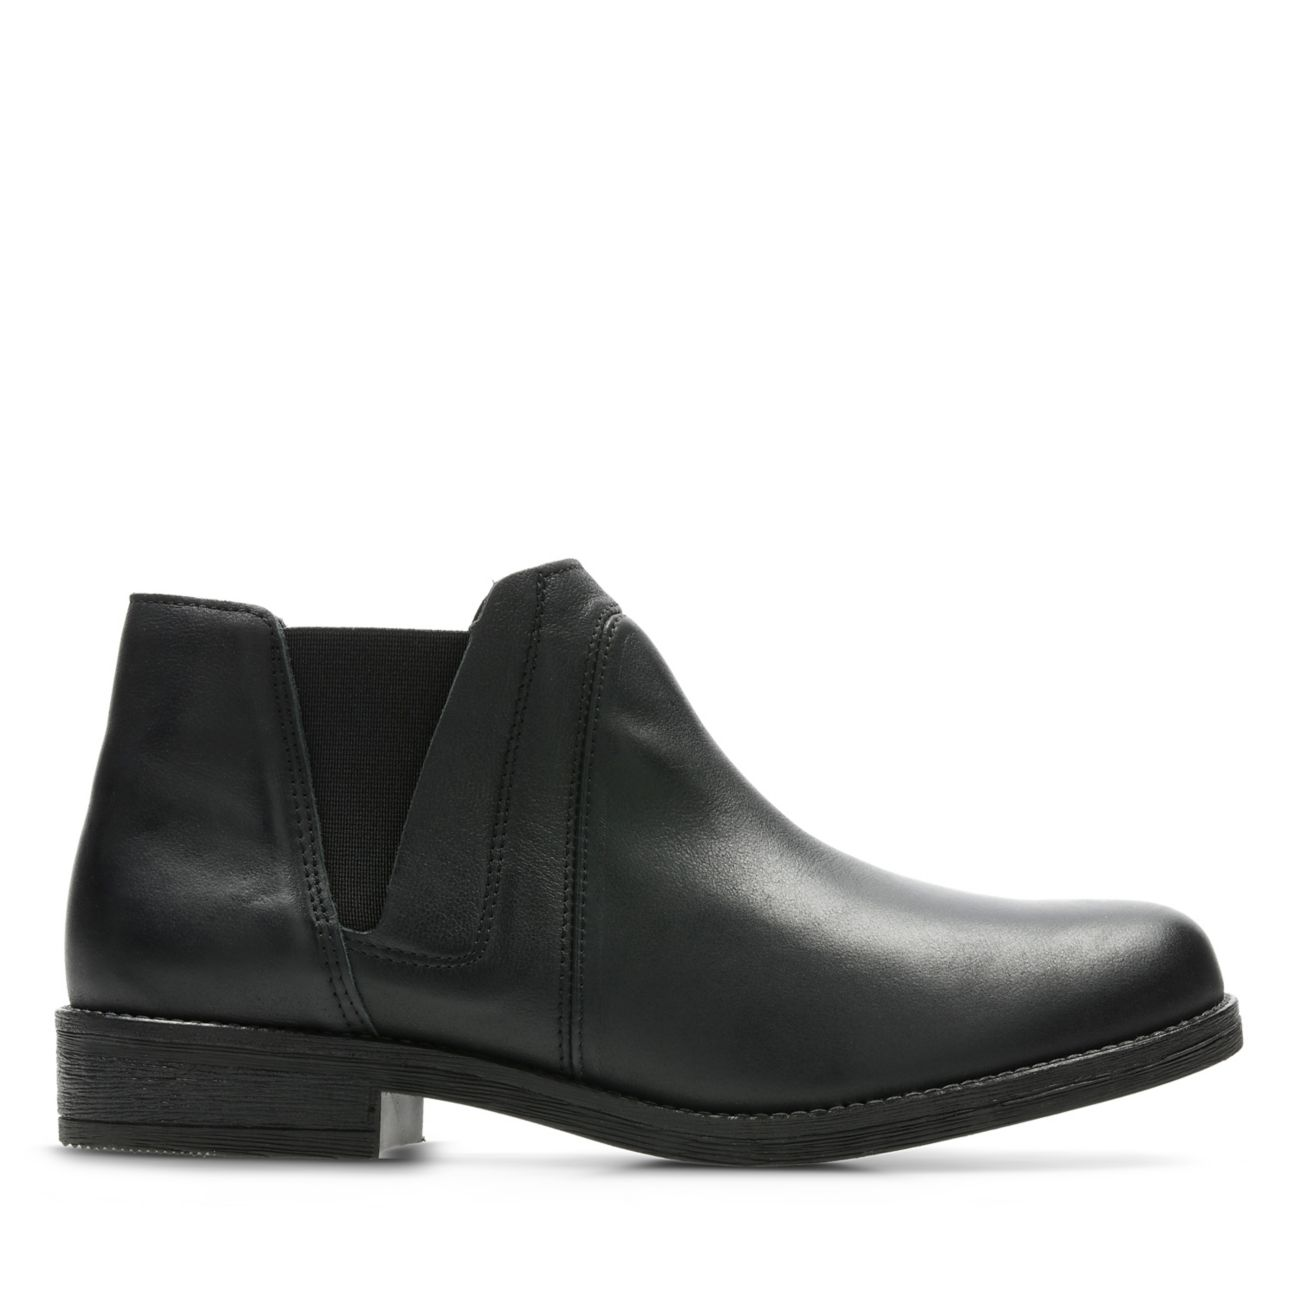 ace609d8b650f9 Demi Beat Black Leather - Women's Boots - Clarks® Shoes Official Site    Clarks